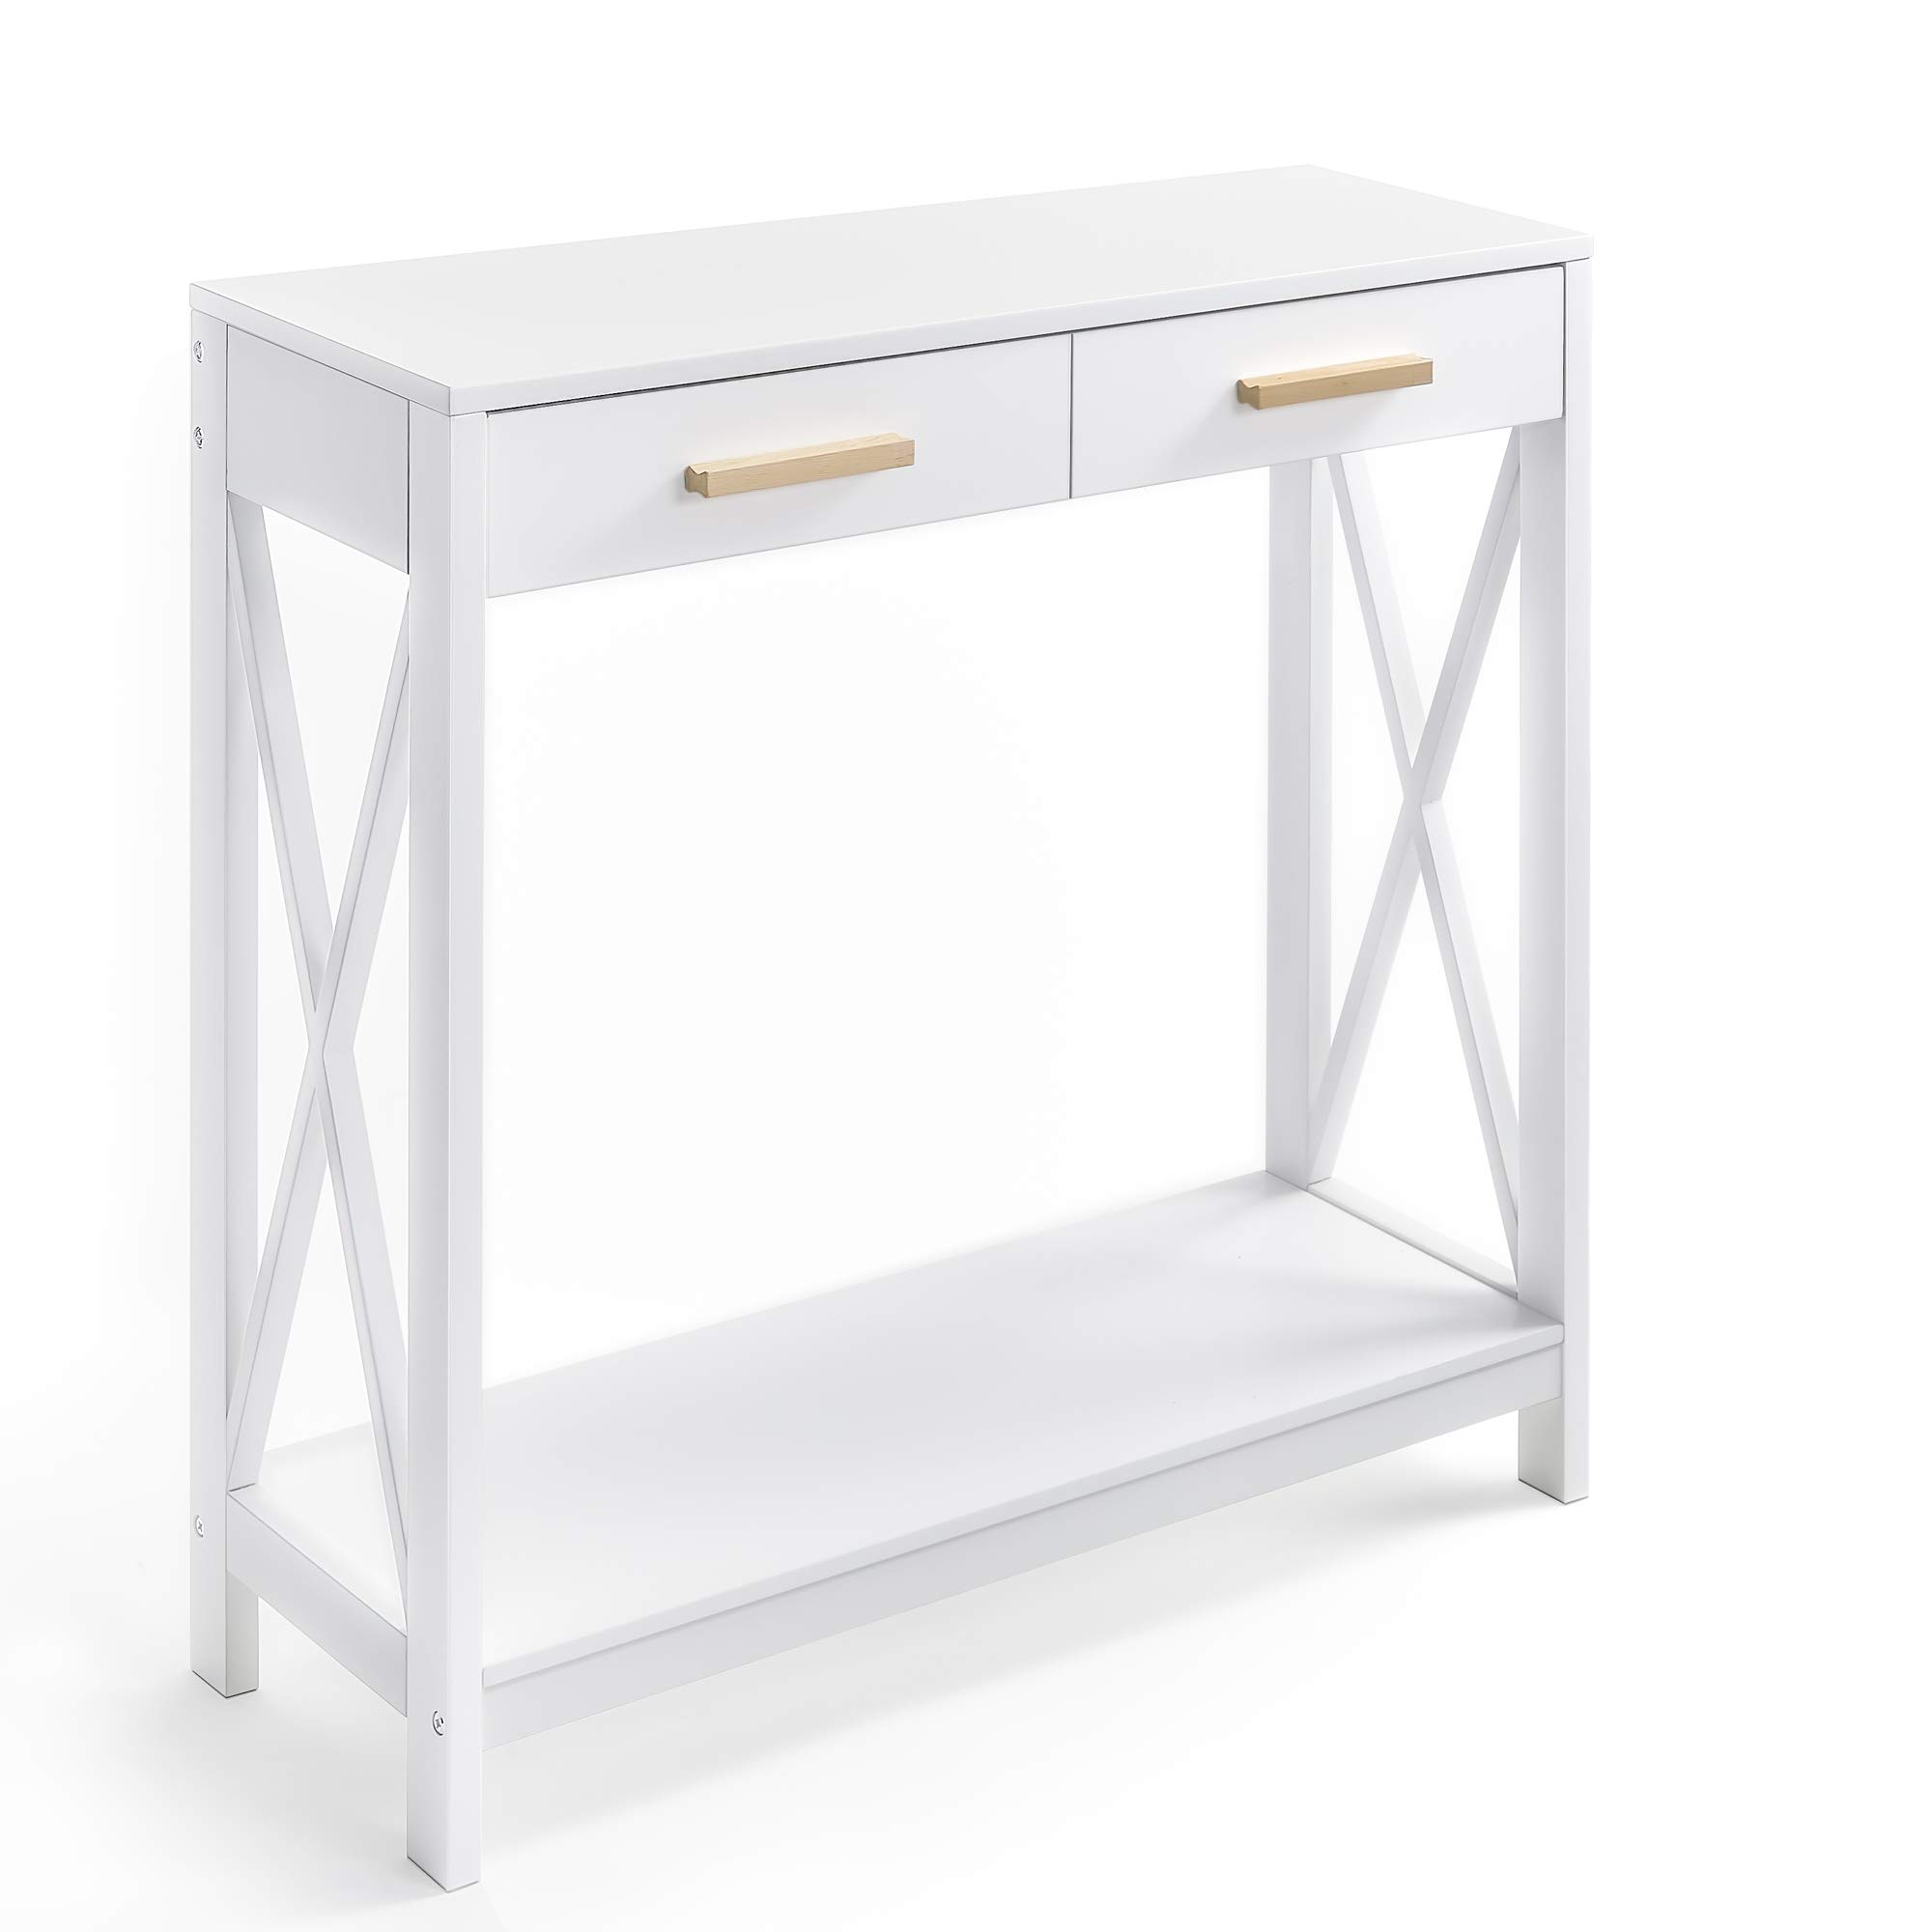 Prosumer's Choice Modern Entryway Console, Narrow Sofa Table w/ Single Drawer Storage by Prosumer's Choice